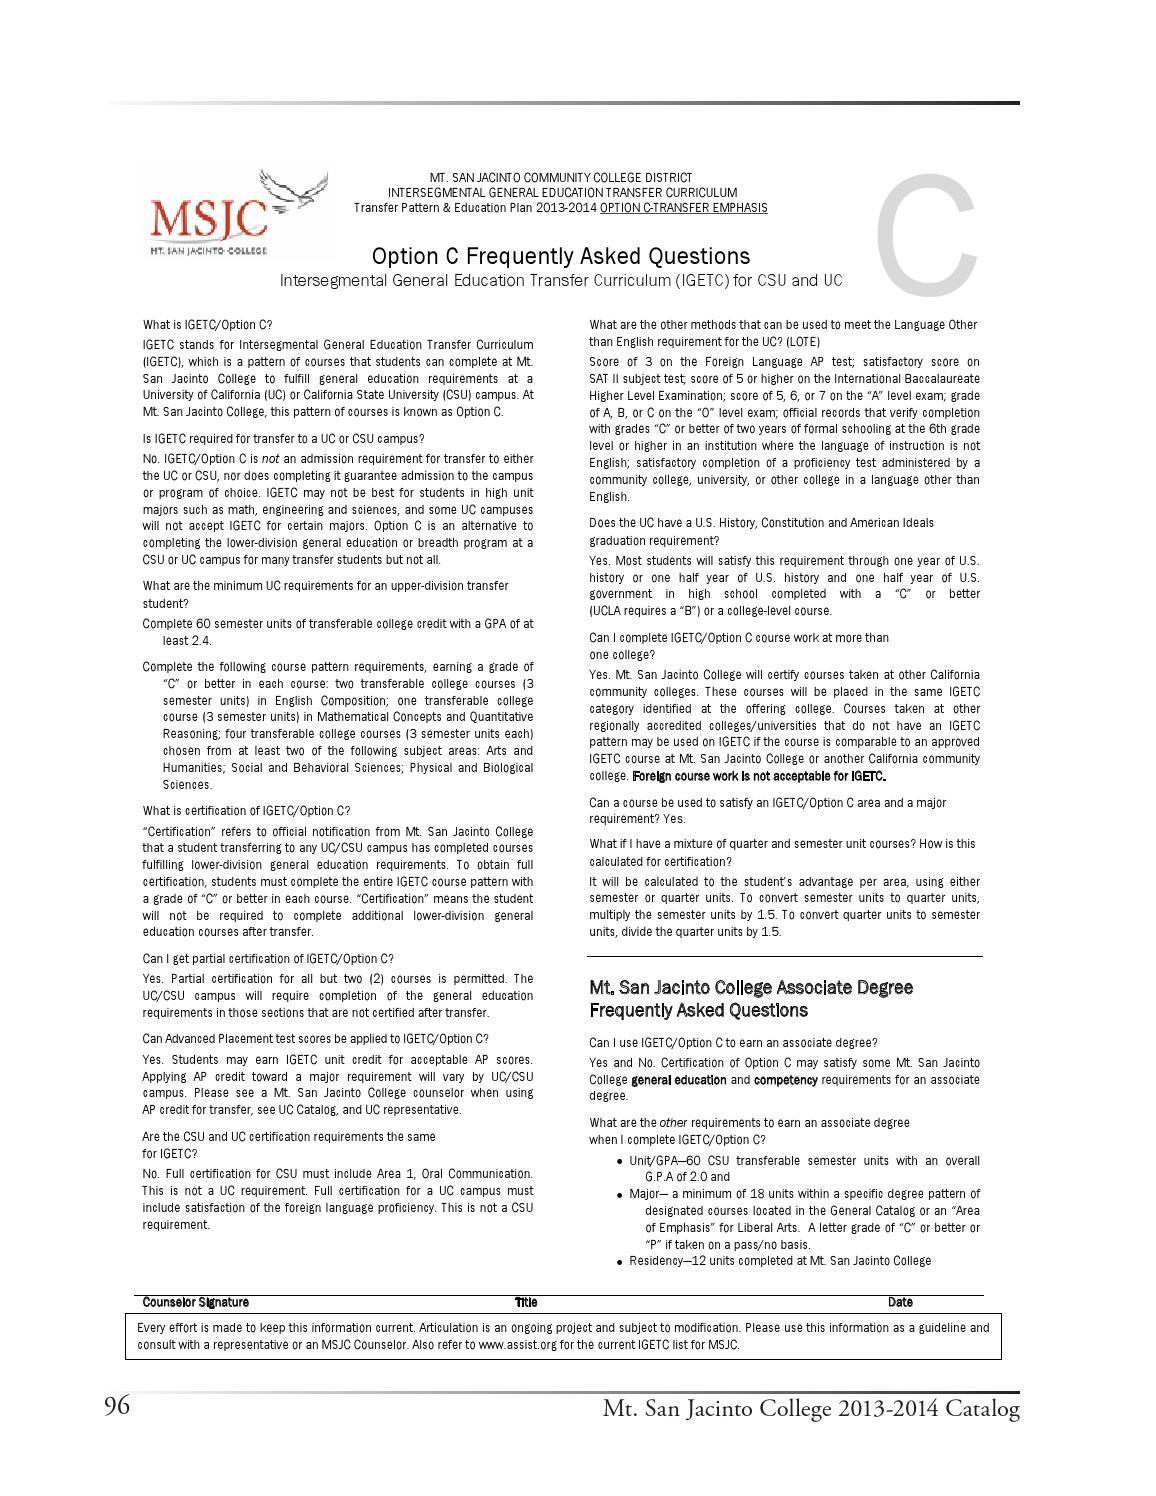 2013 14 Msjc College Catalog By Angela Seavey Issuu